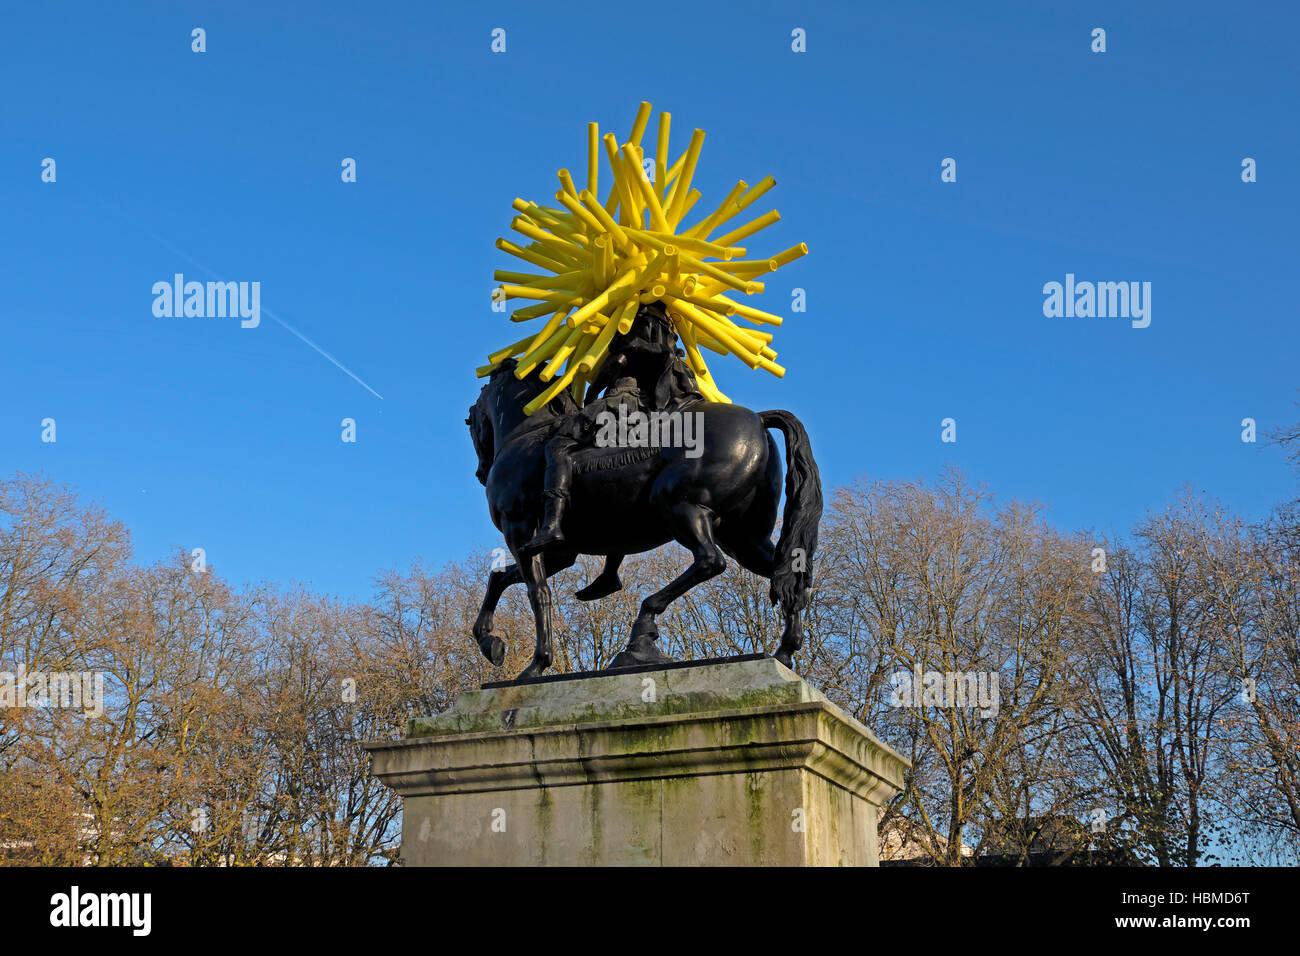 A sculpture by artist Duncan McKellar surmounts John Michael Rysbrack's 1733 equestrian statue of William III - Stock Image